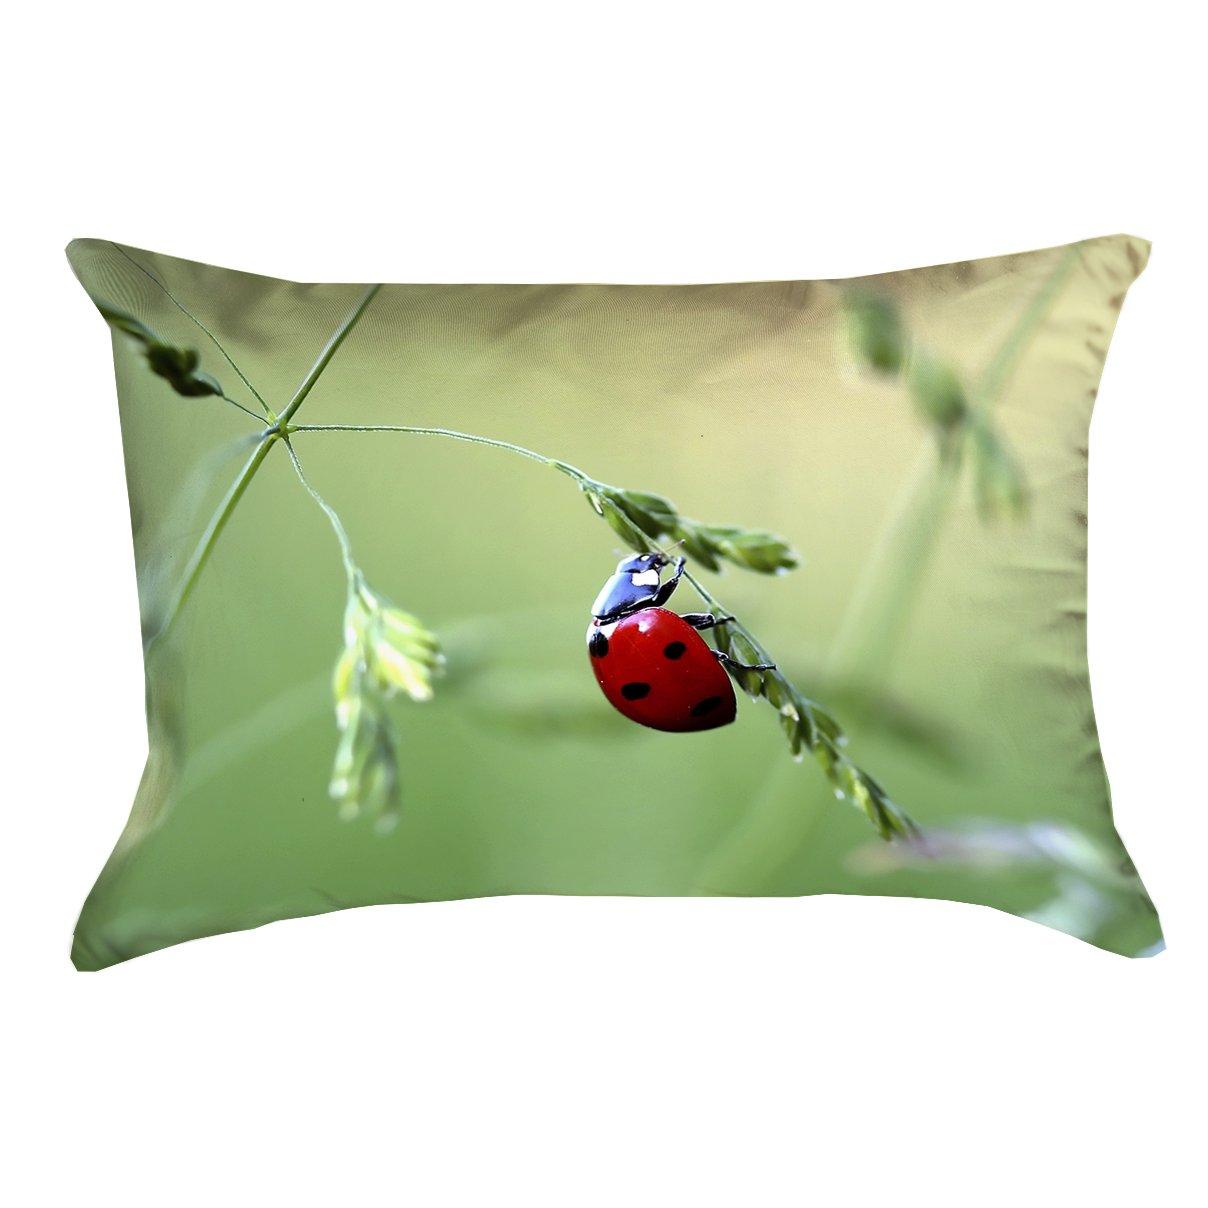 ArtVerse Myriam 14 x 14 Spun Polyester Ladybug Pillow